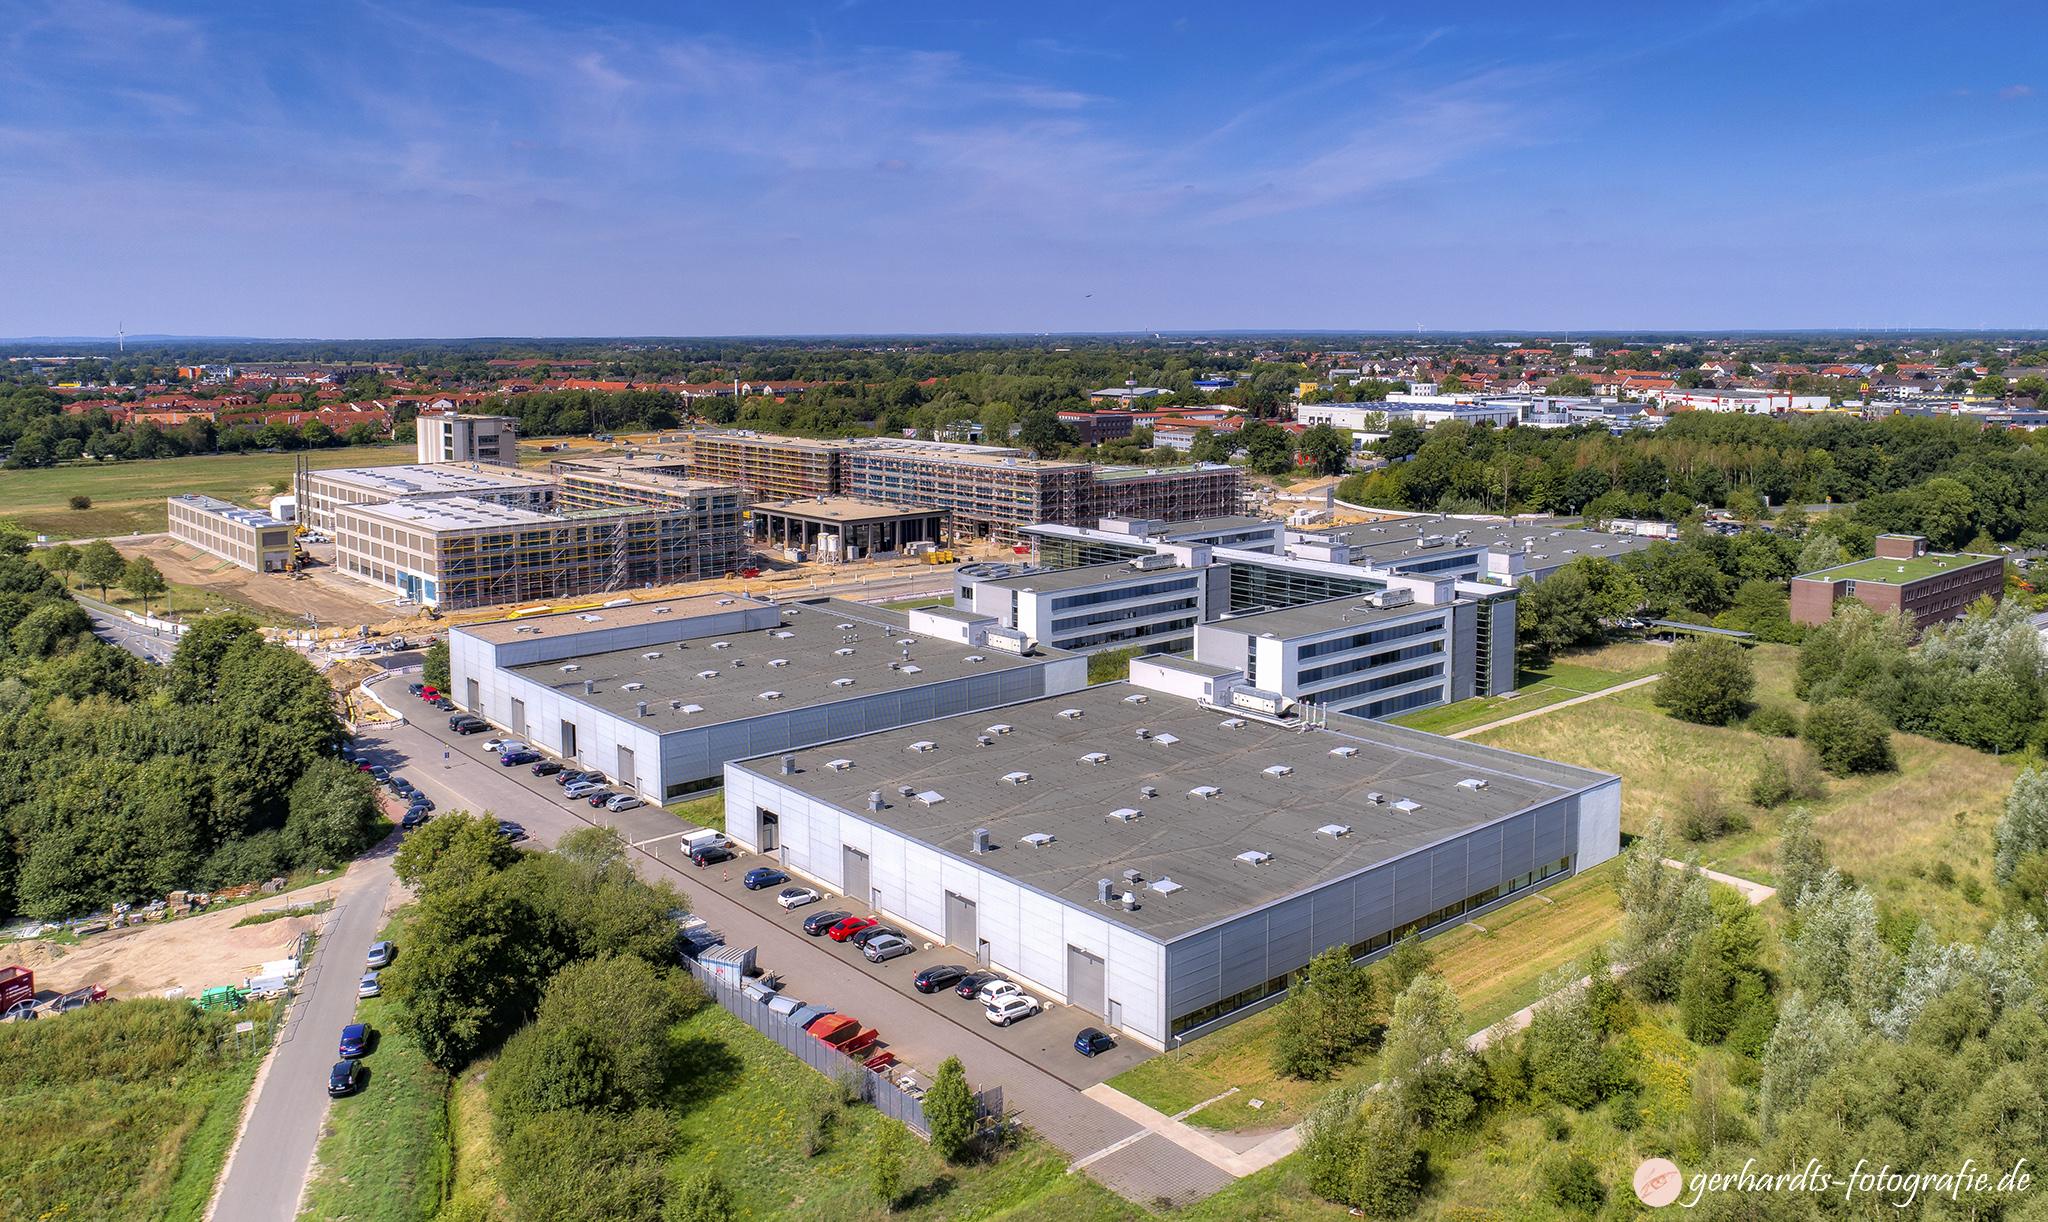 Leibniz Universität Hannover PZH Luftbild - Luftbildfotografie Göttingen